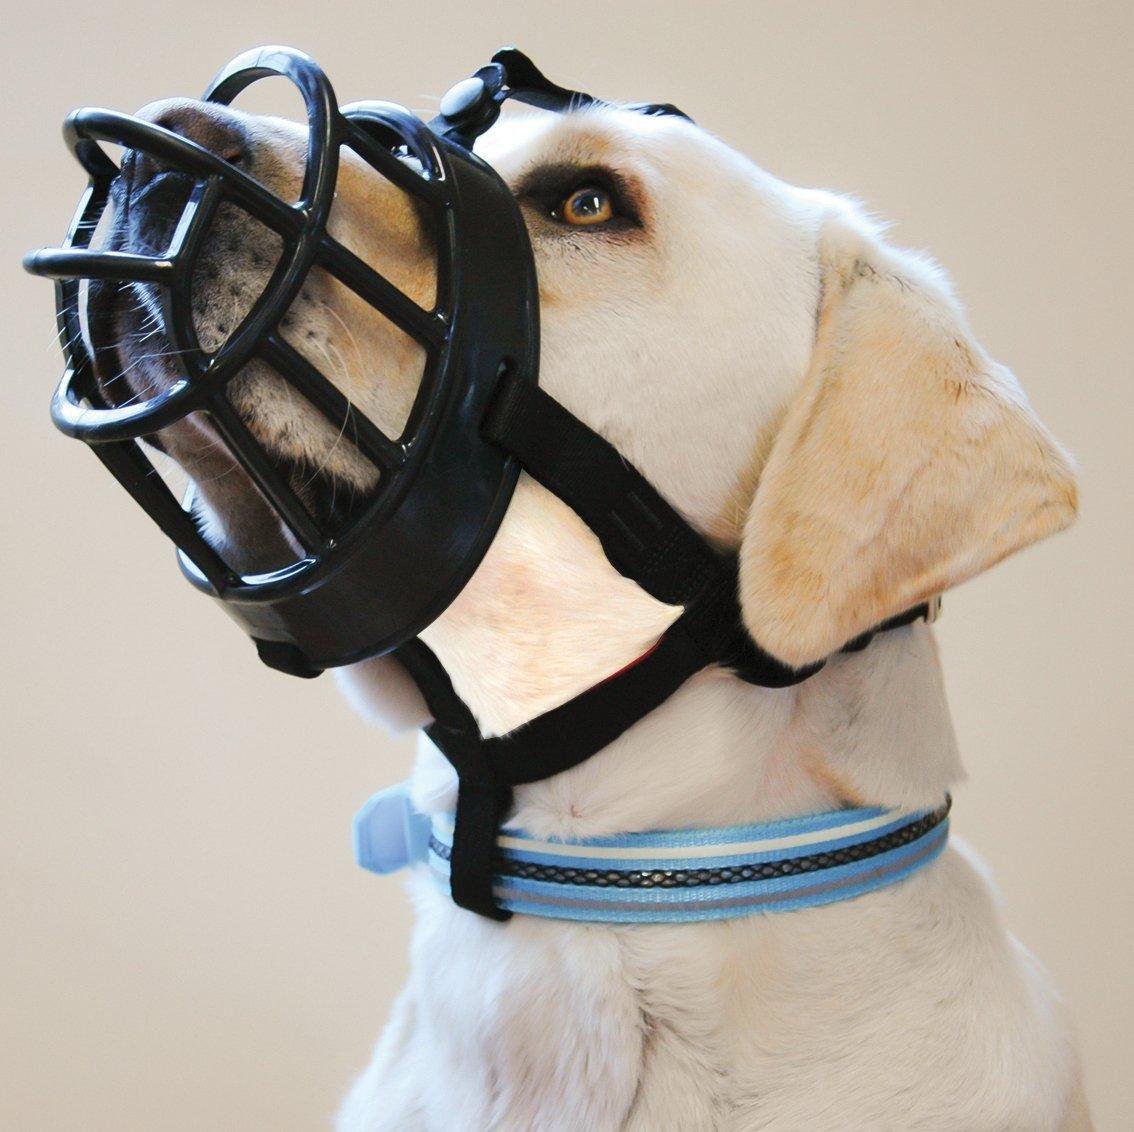 Baskerville Ultra Dog Muzzle Size 6, Black, Muzzle Suitable for Mastiff, German Shepherd....